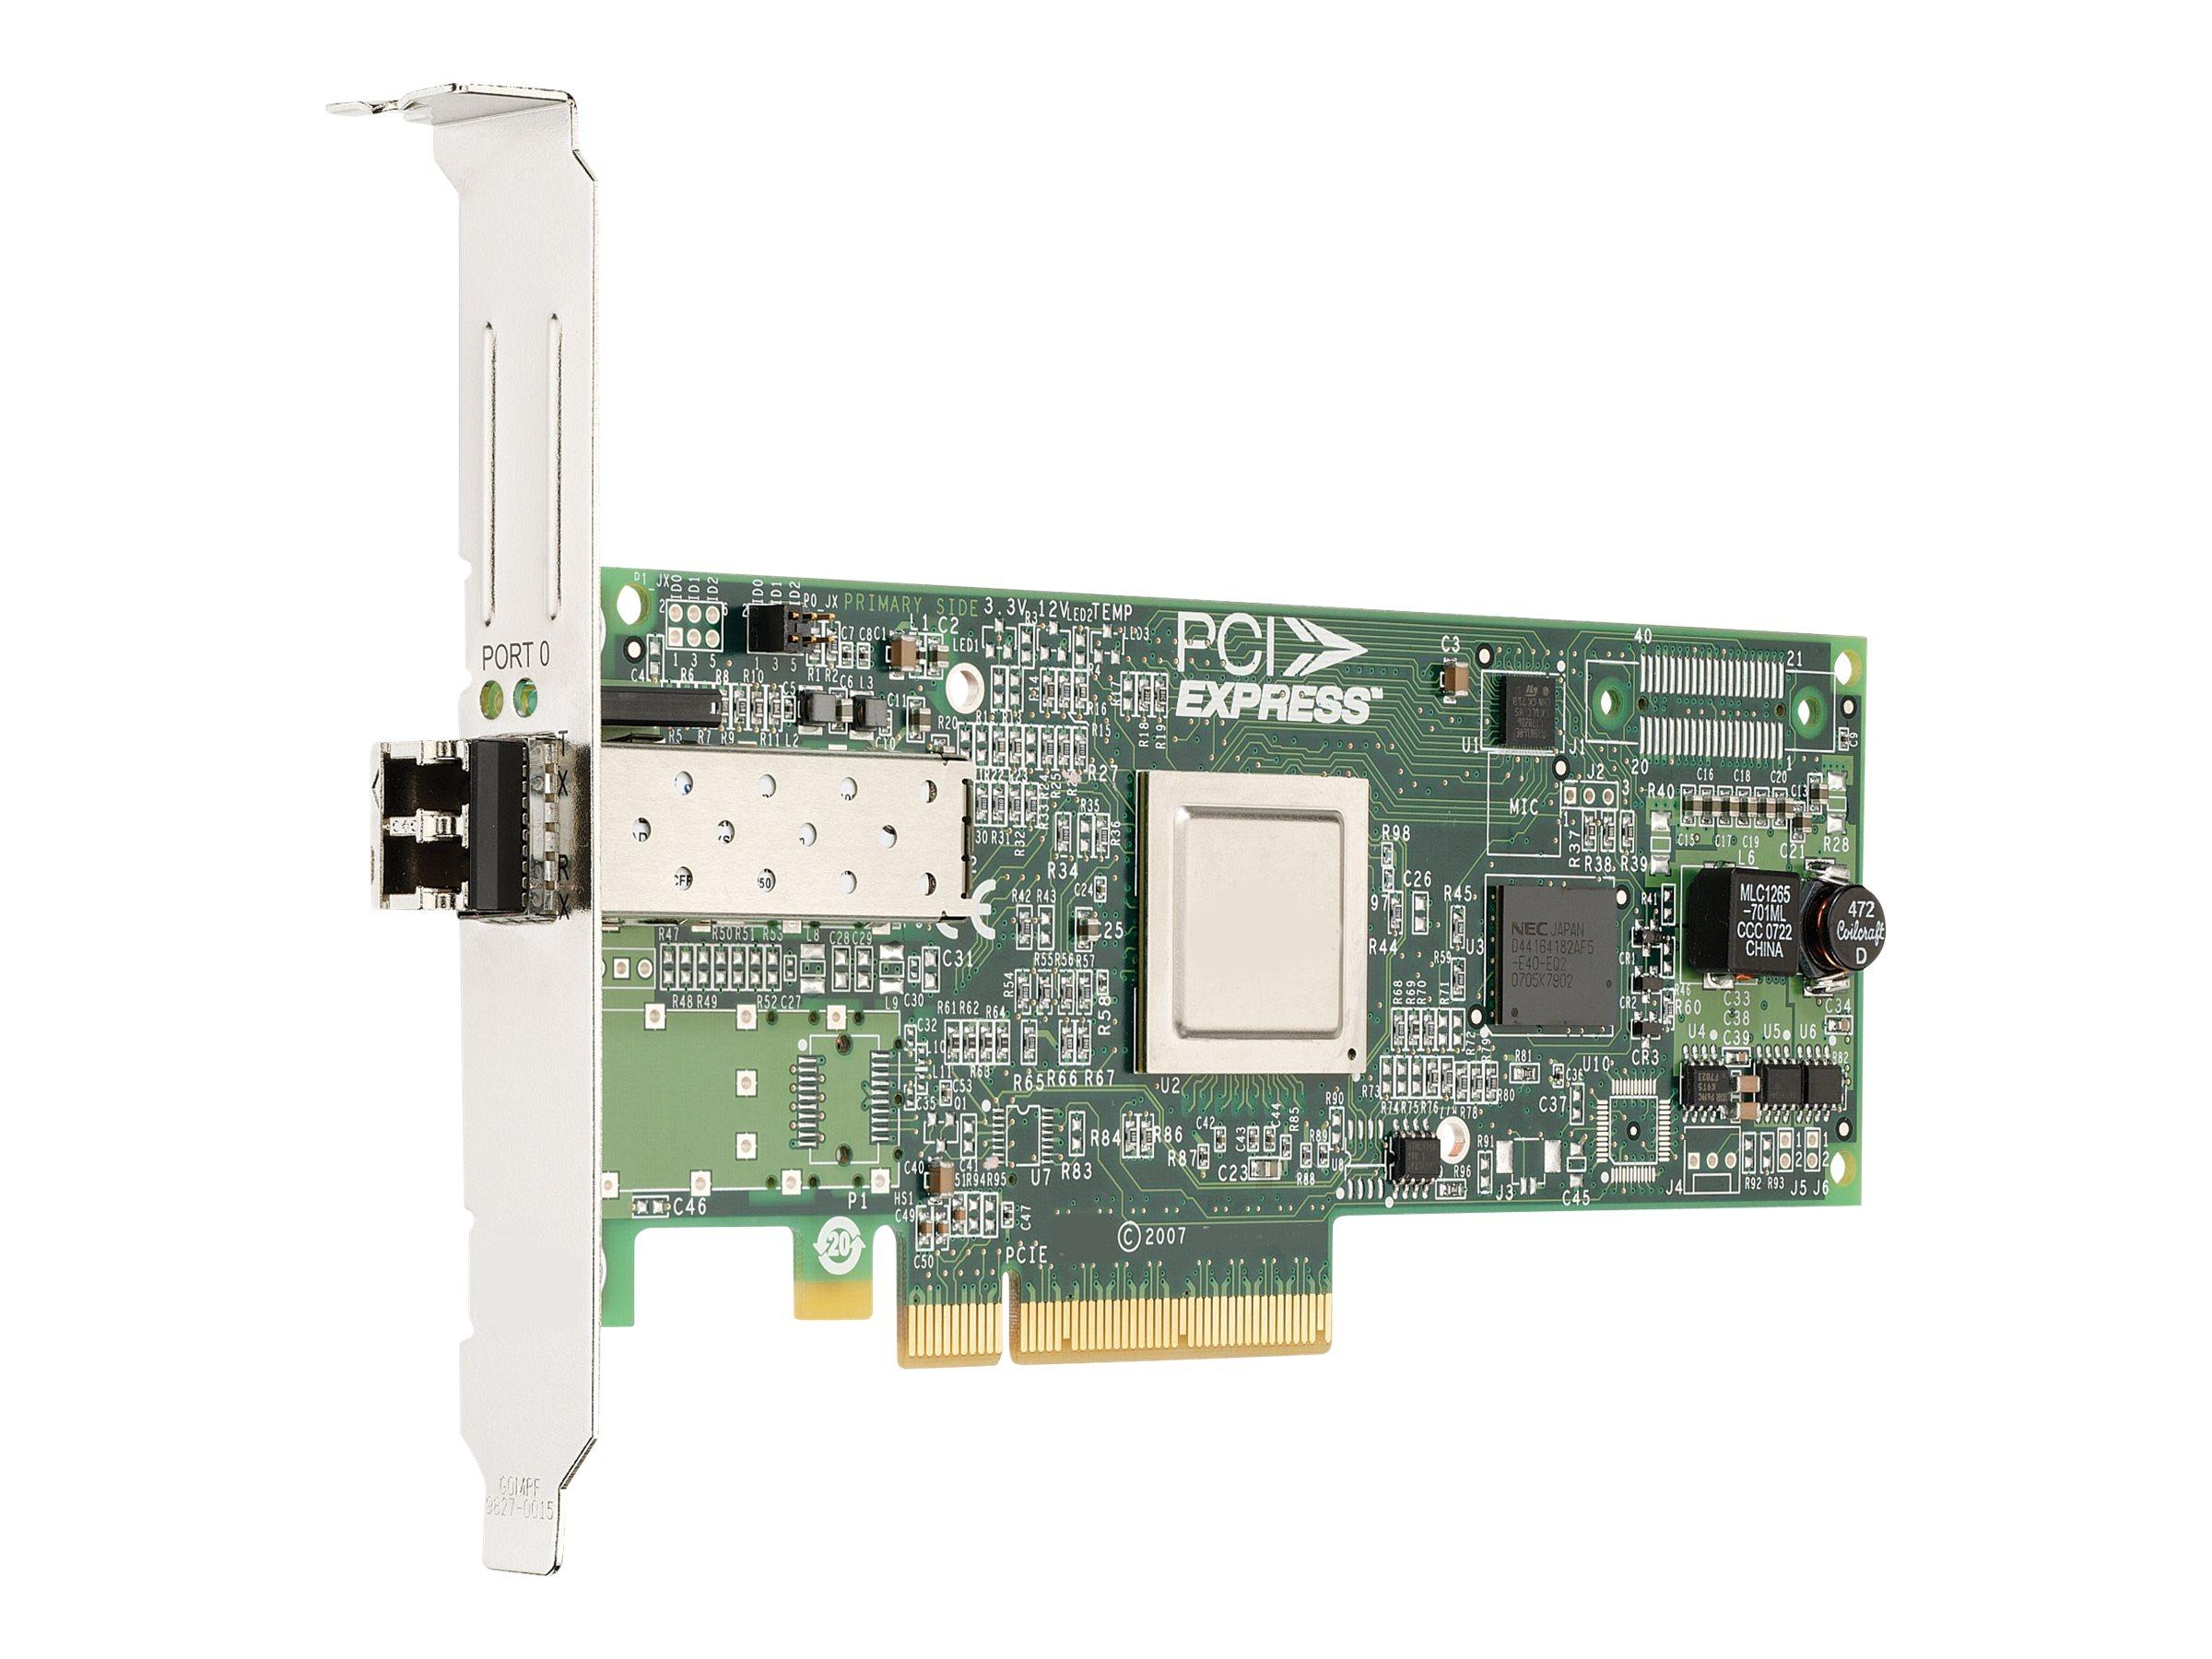 Emulex LPe12000-M8 8GFC, single-port HBA - Netzwerkadapter - PCIe x8 - 8Gb Fibre Channel